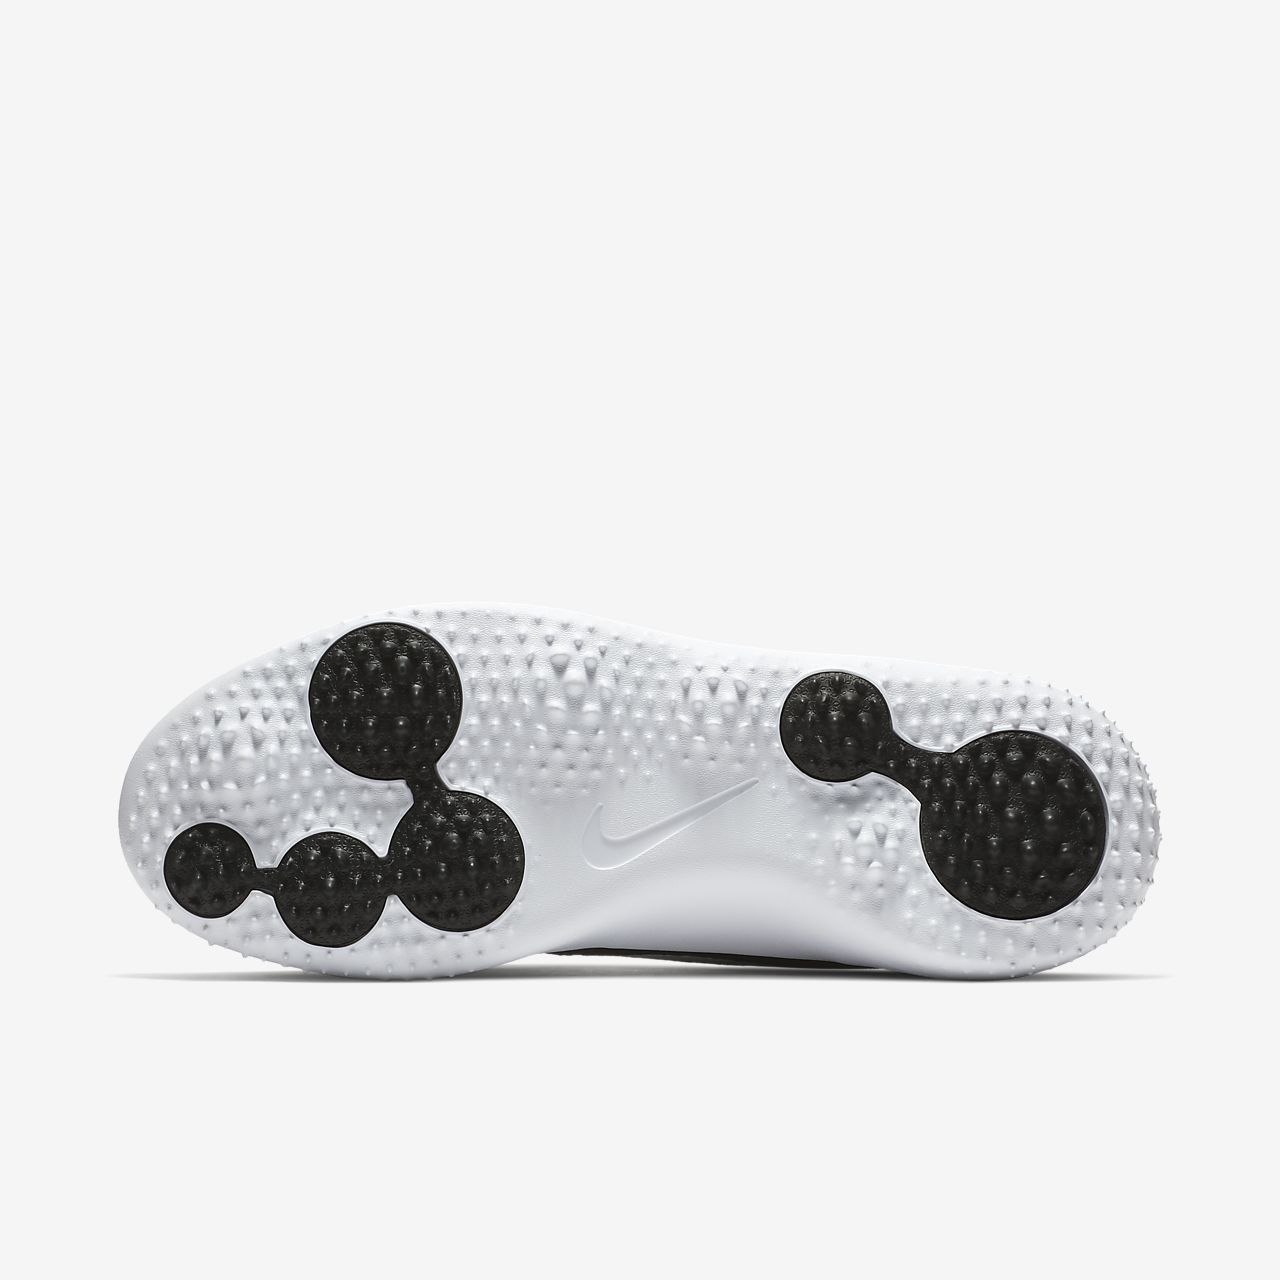 1abcb554dc4b6 Nike Roshe G Women s Golf Shoe. Nike.com GB